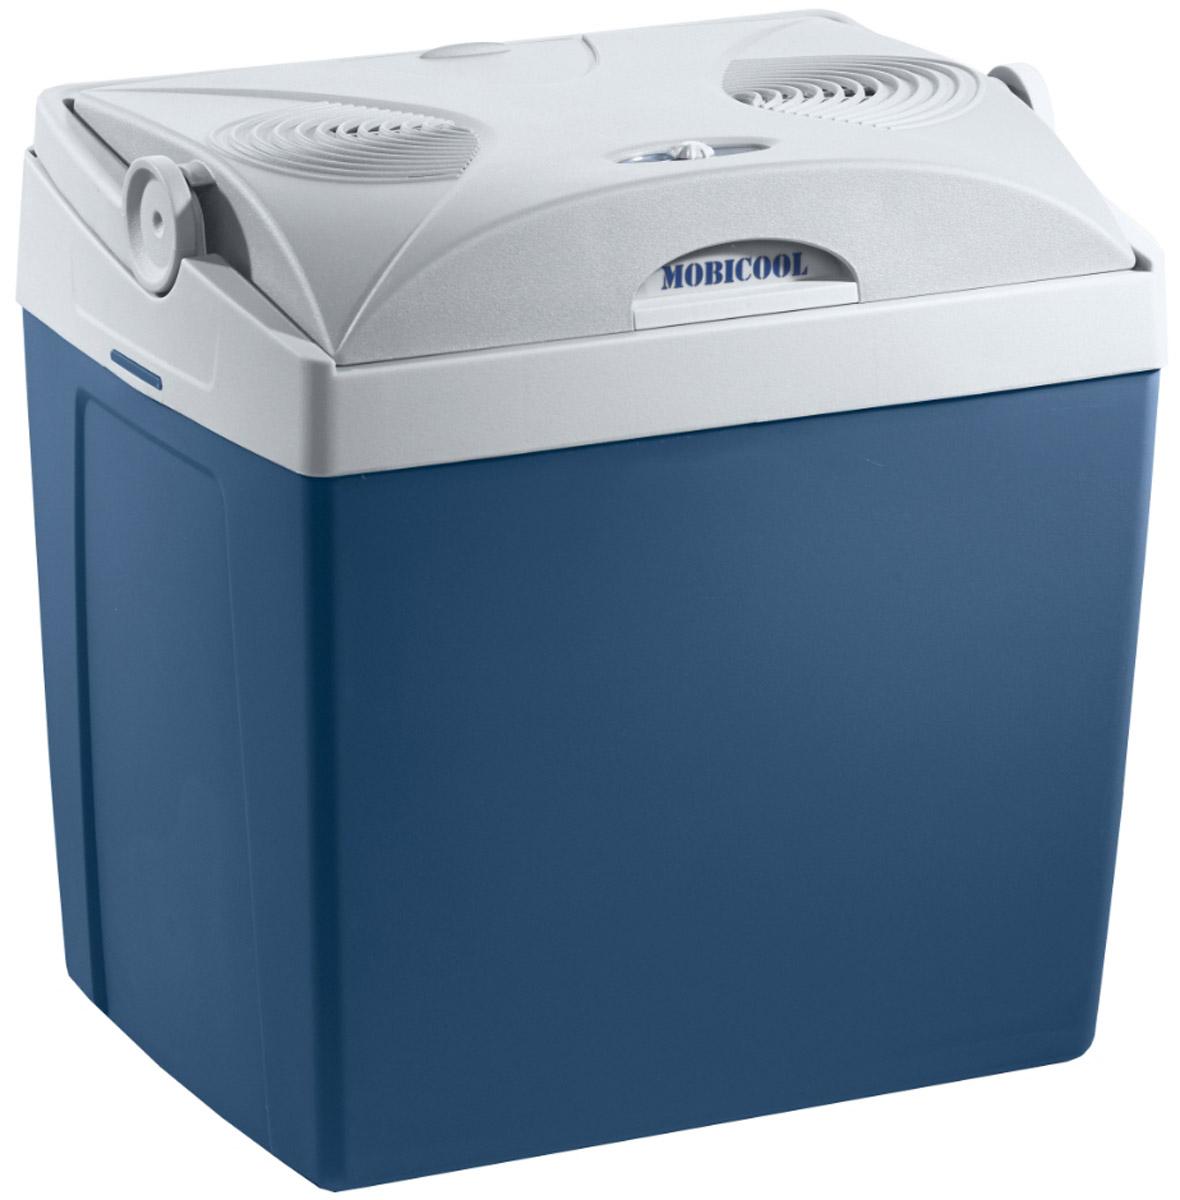 MOBICOOL V30 AC/DC автохолодильник mobicool g35 ac dc